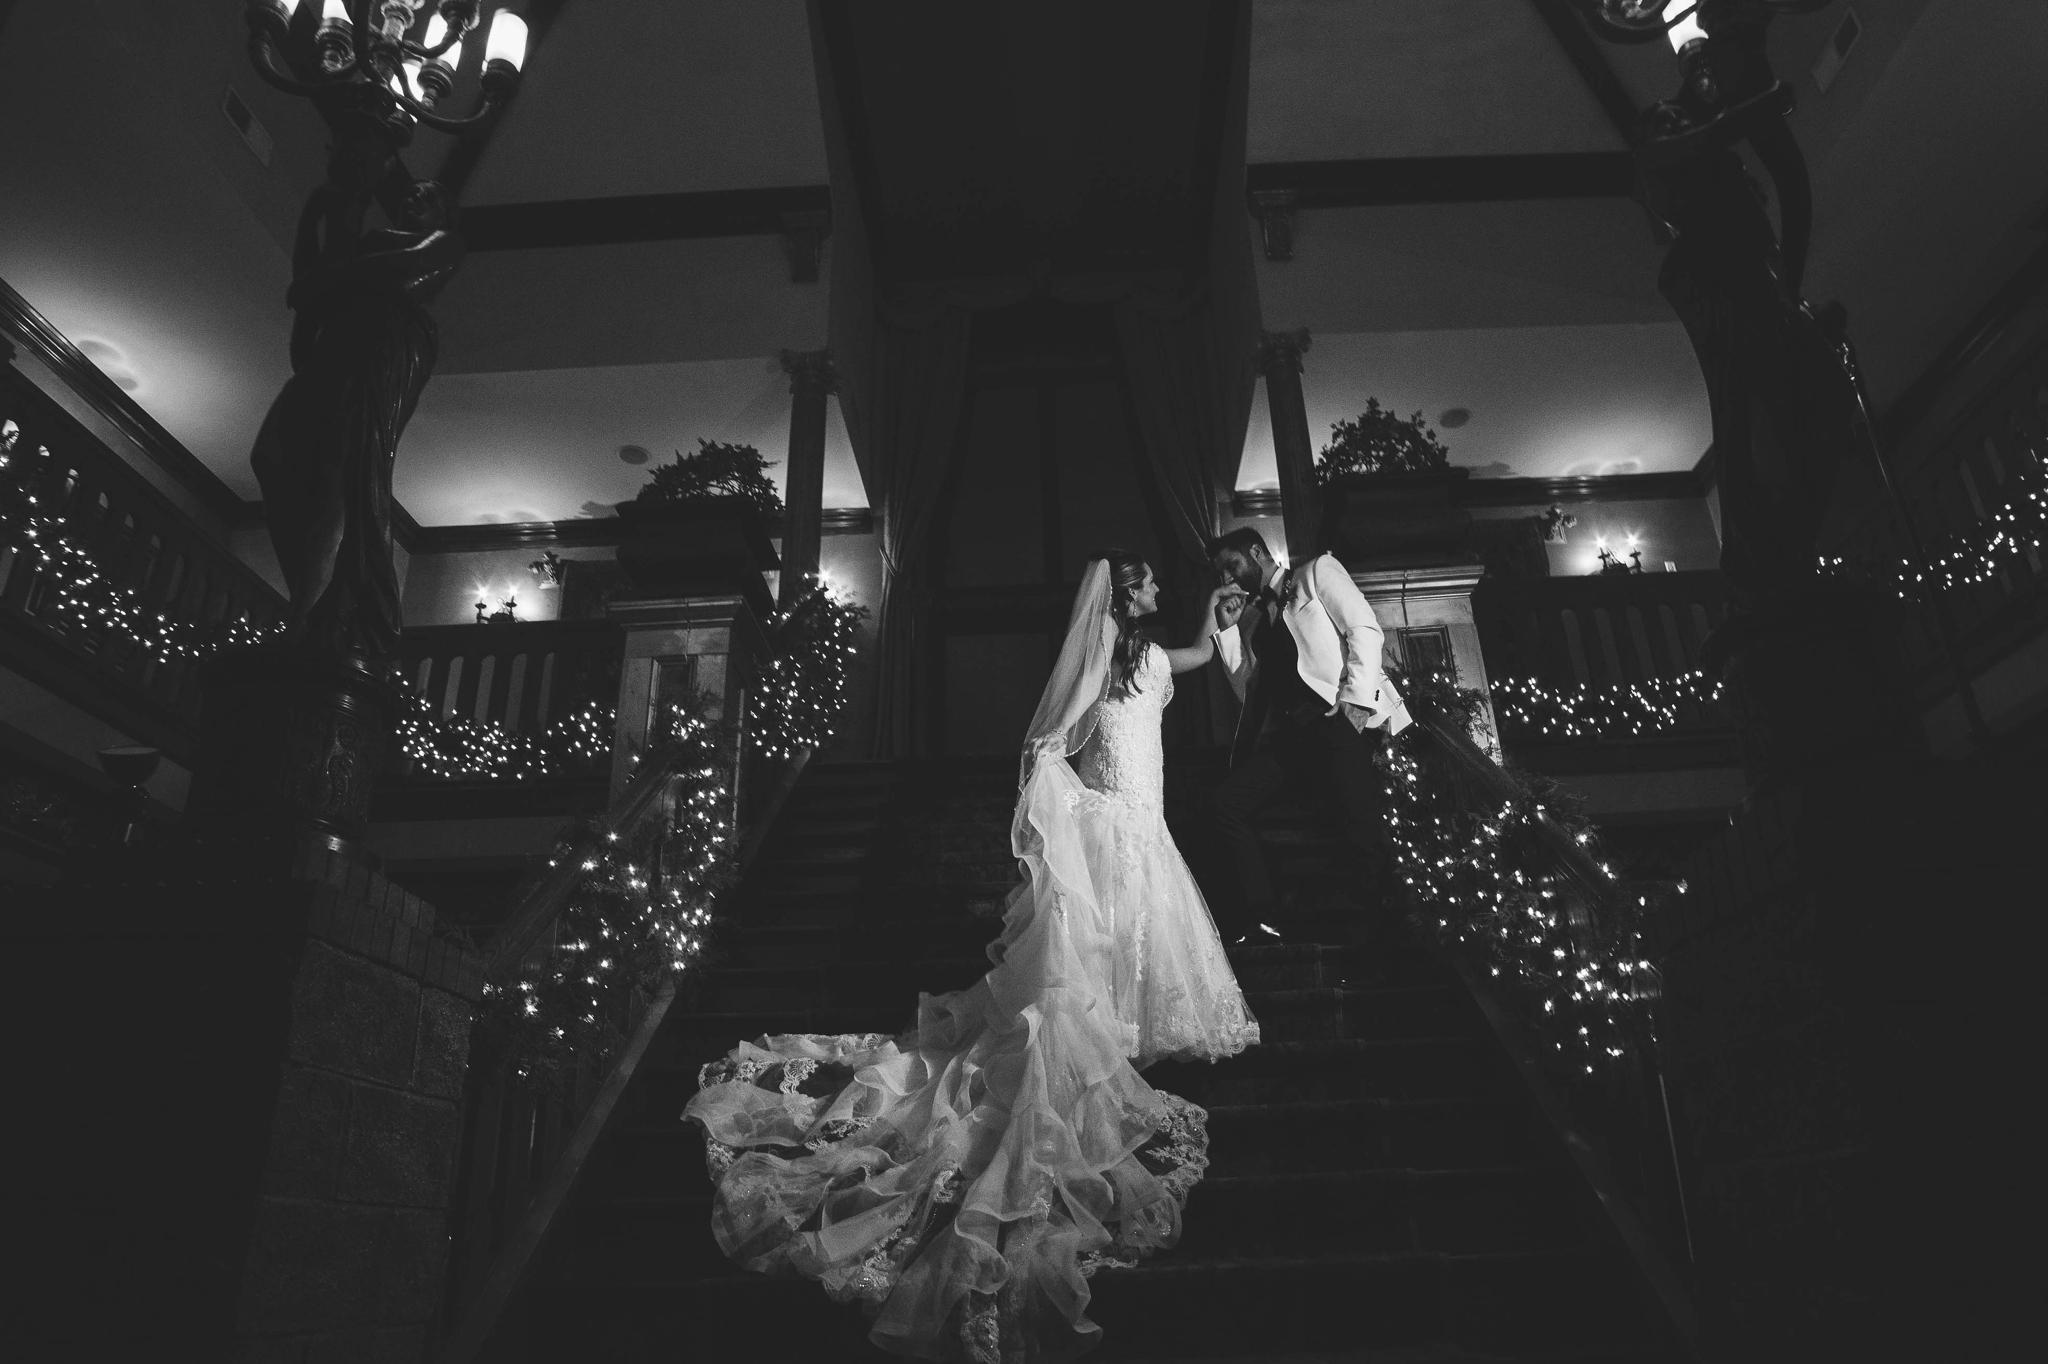 Portraits of the Bride and Groom at night - Honolulu Oahu Hawaii Wedding Photographer